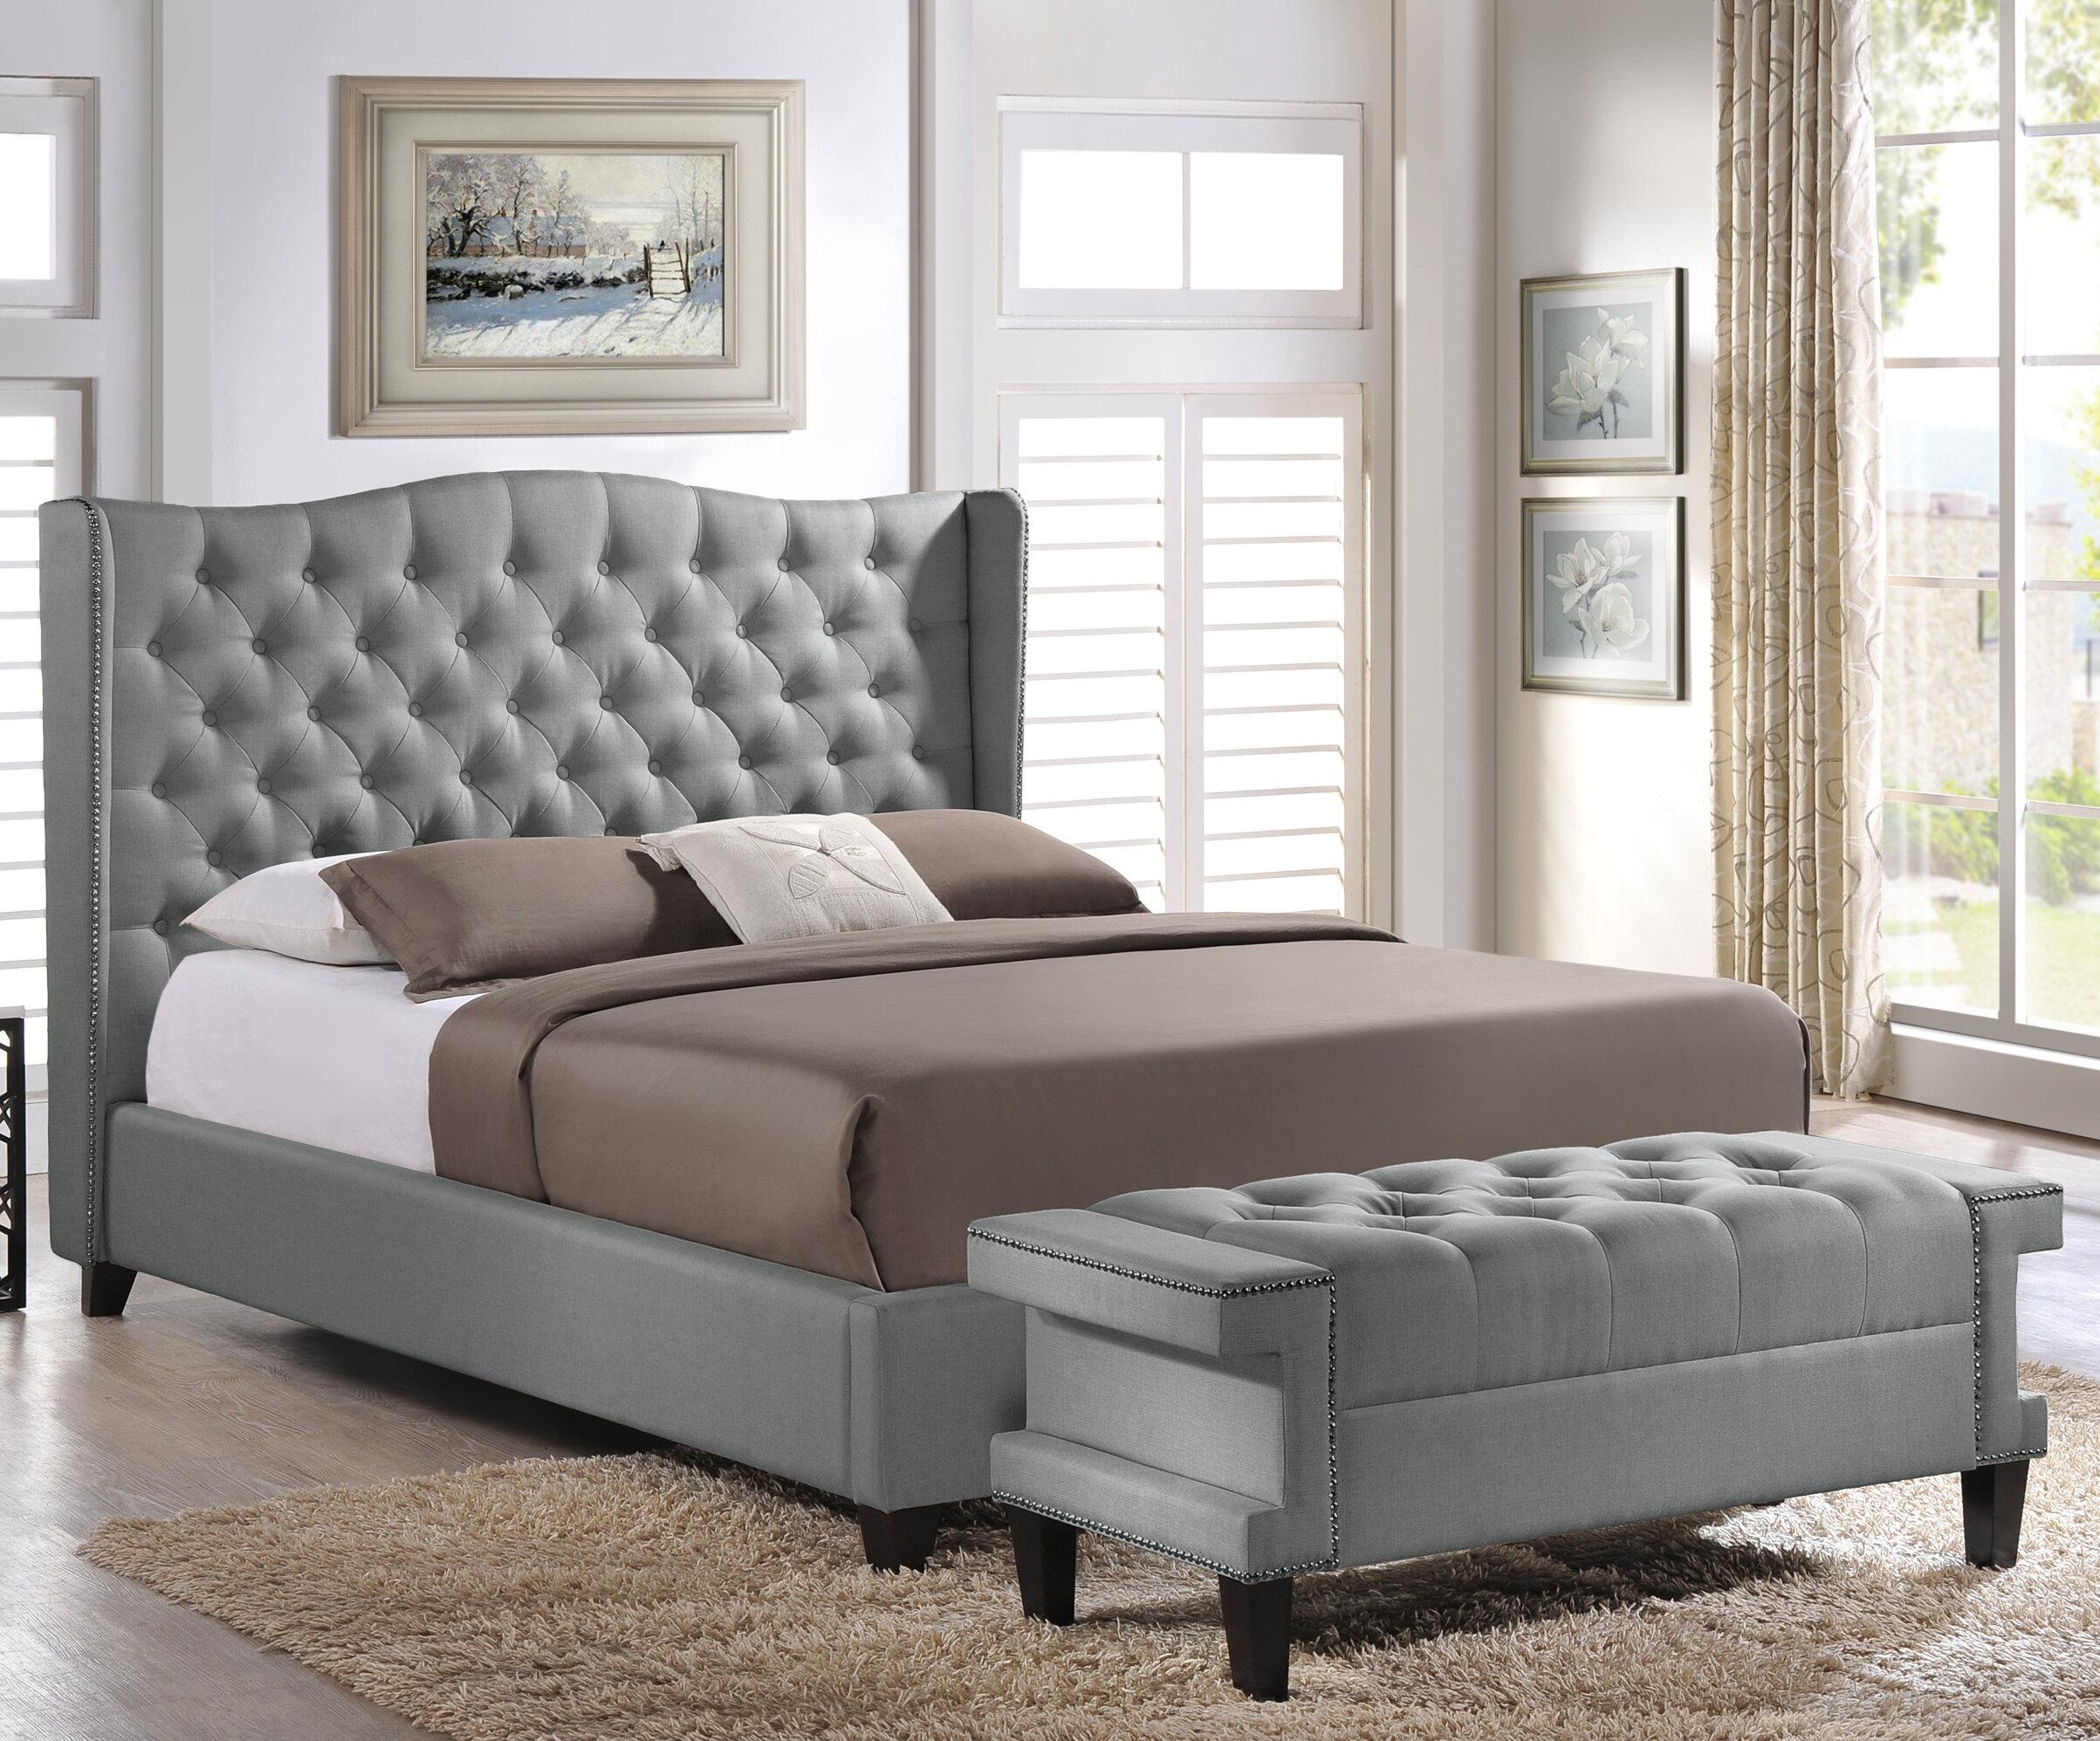 Fantastic Licata Upholstered Platform Bed And Bench Set Pdpeps Interior Chair Design Pdpepsorg